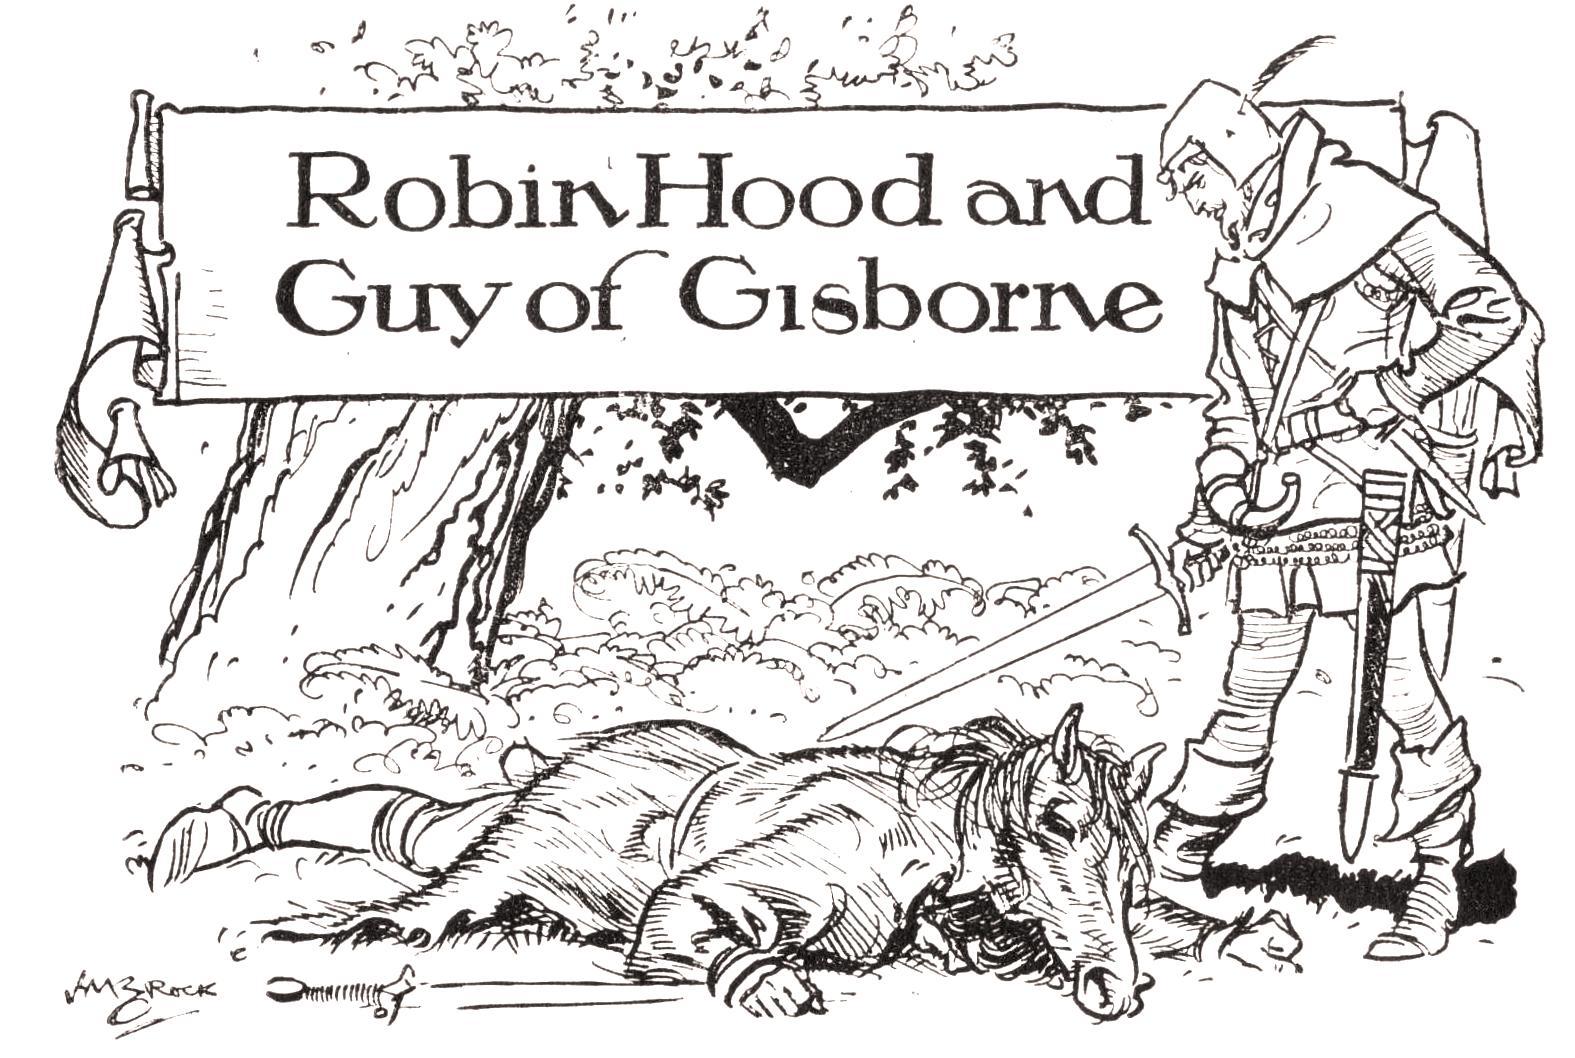 Walt Disney's Story Of Robin Hood: The Bird That Woke